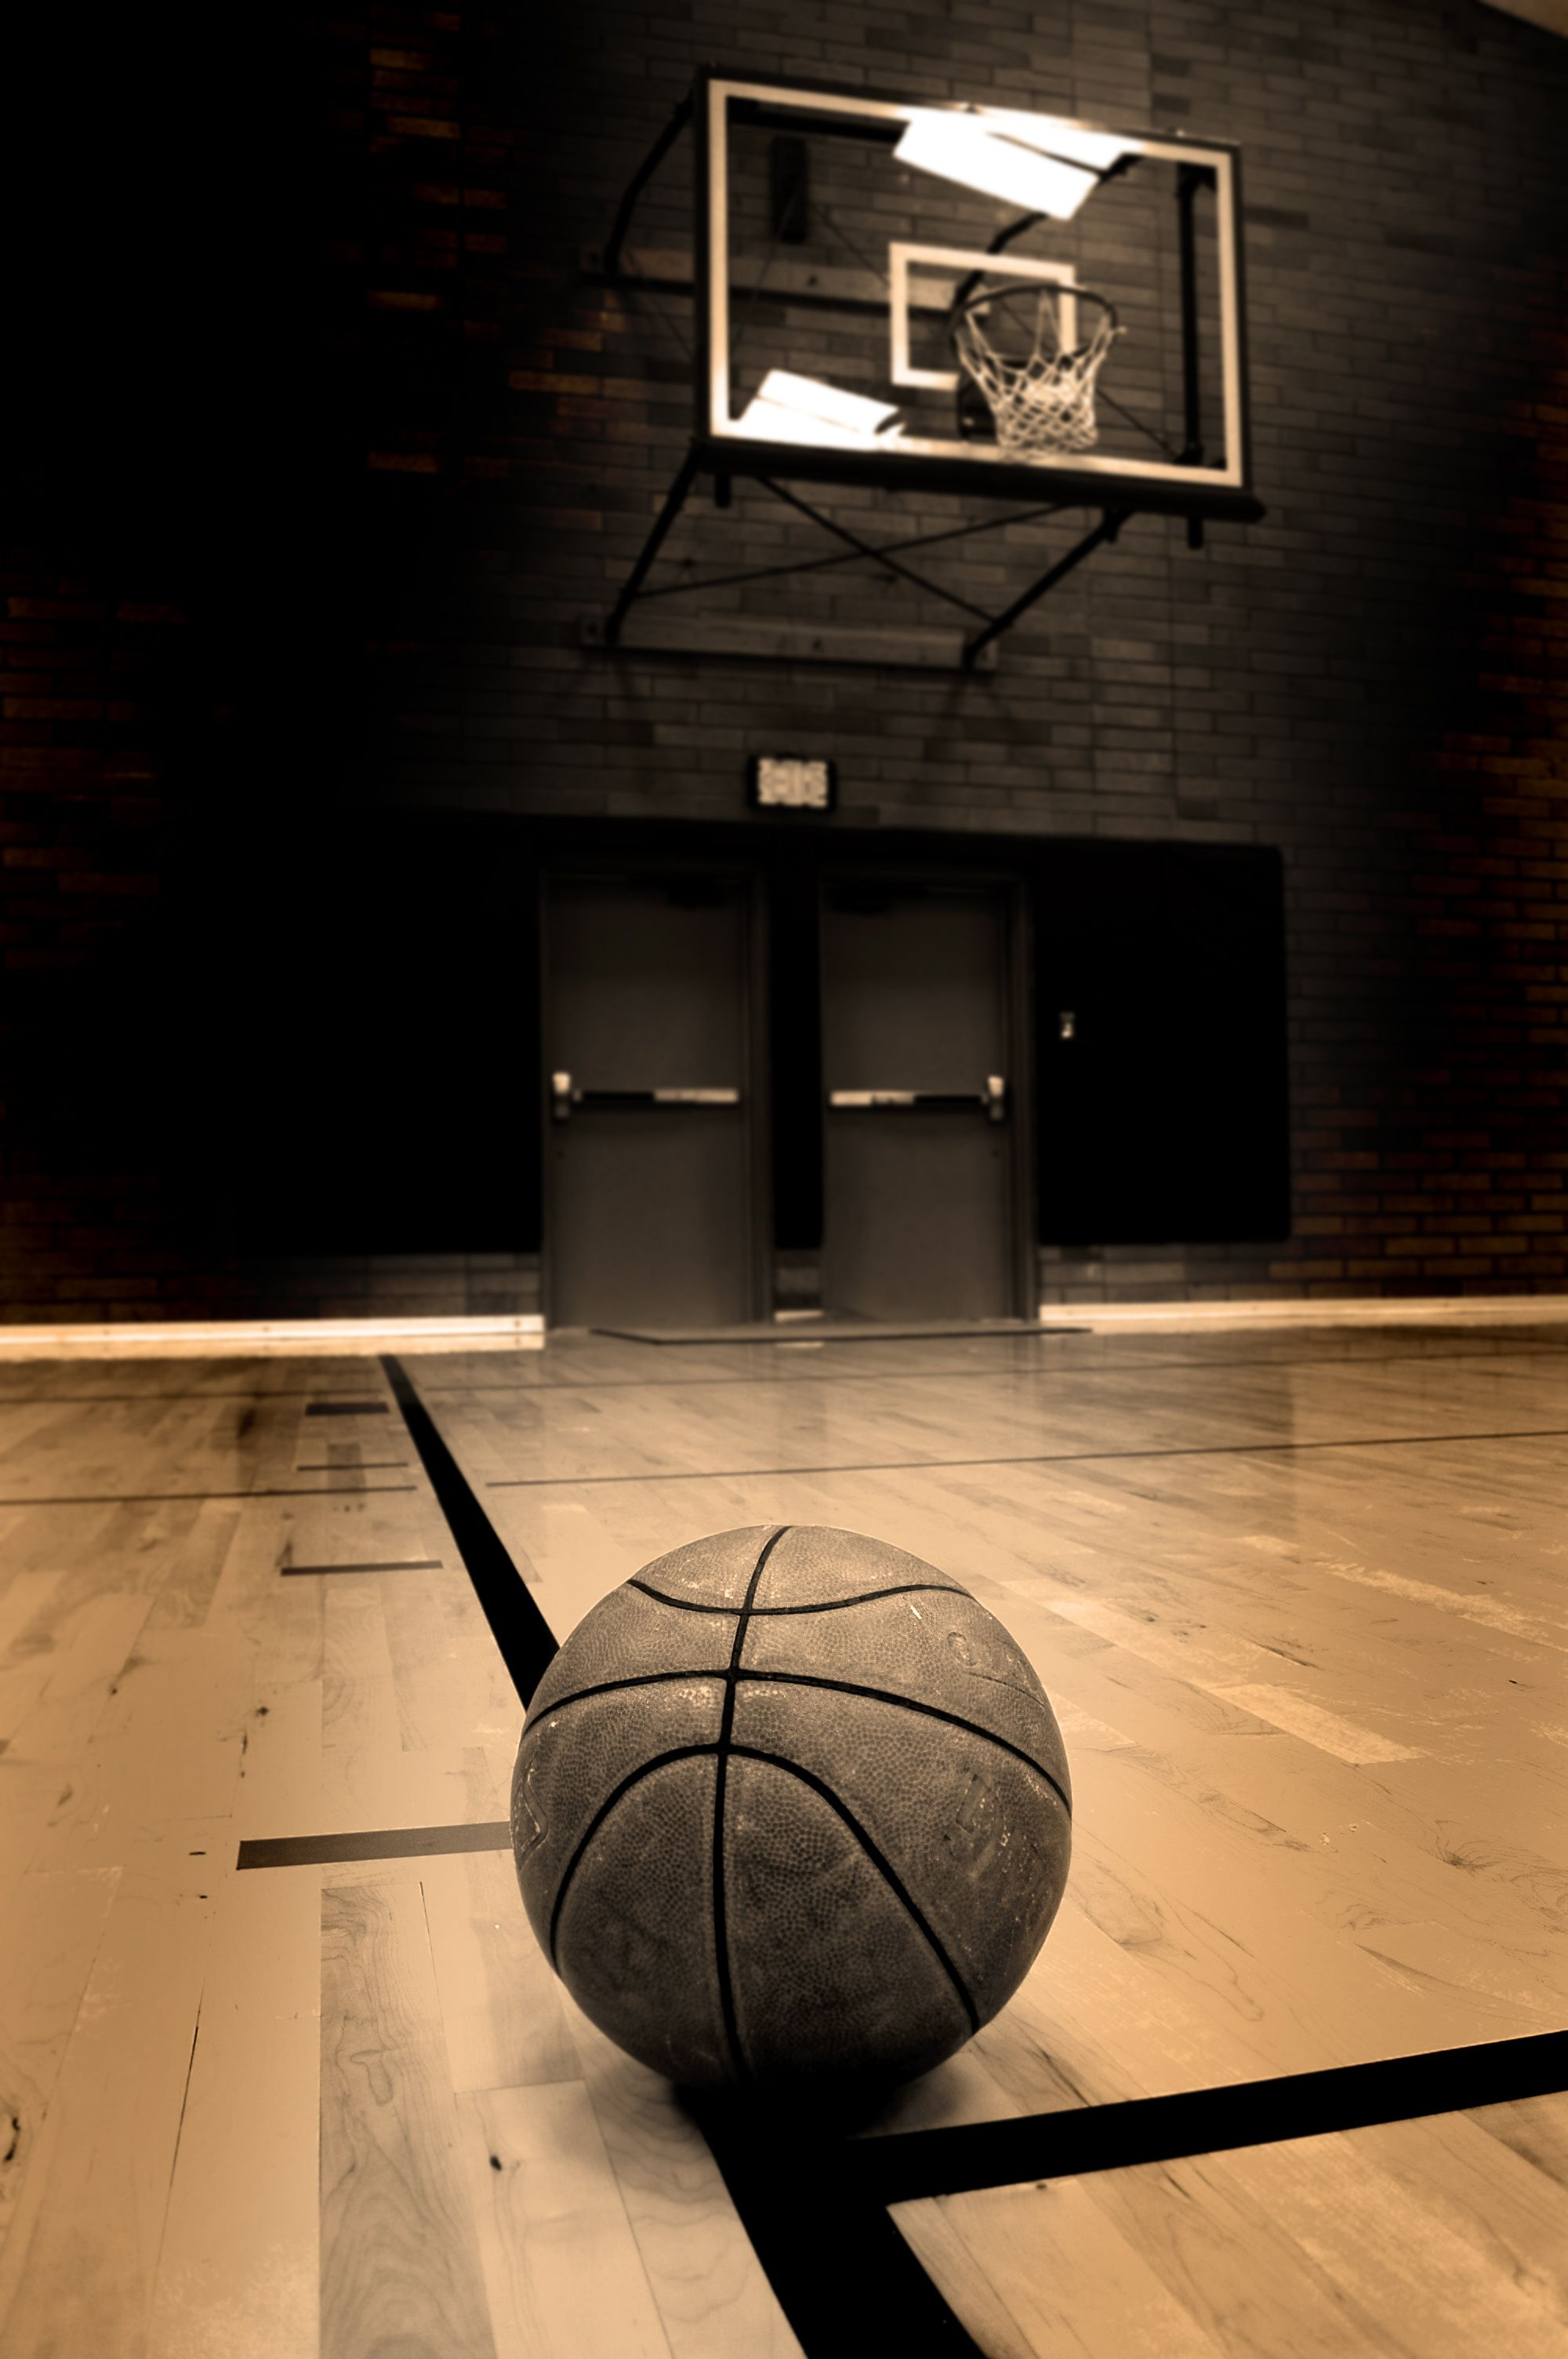 Daily Fantasy Sports Strategy Picks Rankings Tips And Lineups Basketball Wallpaper Sports Basketball Basketball Background